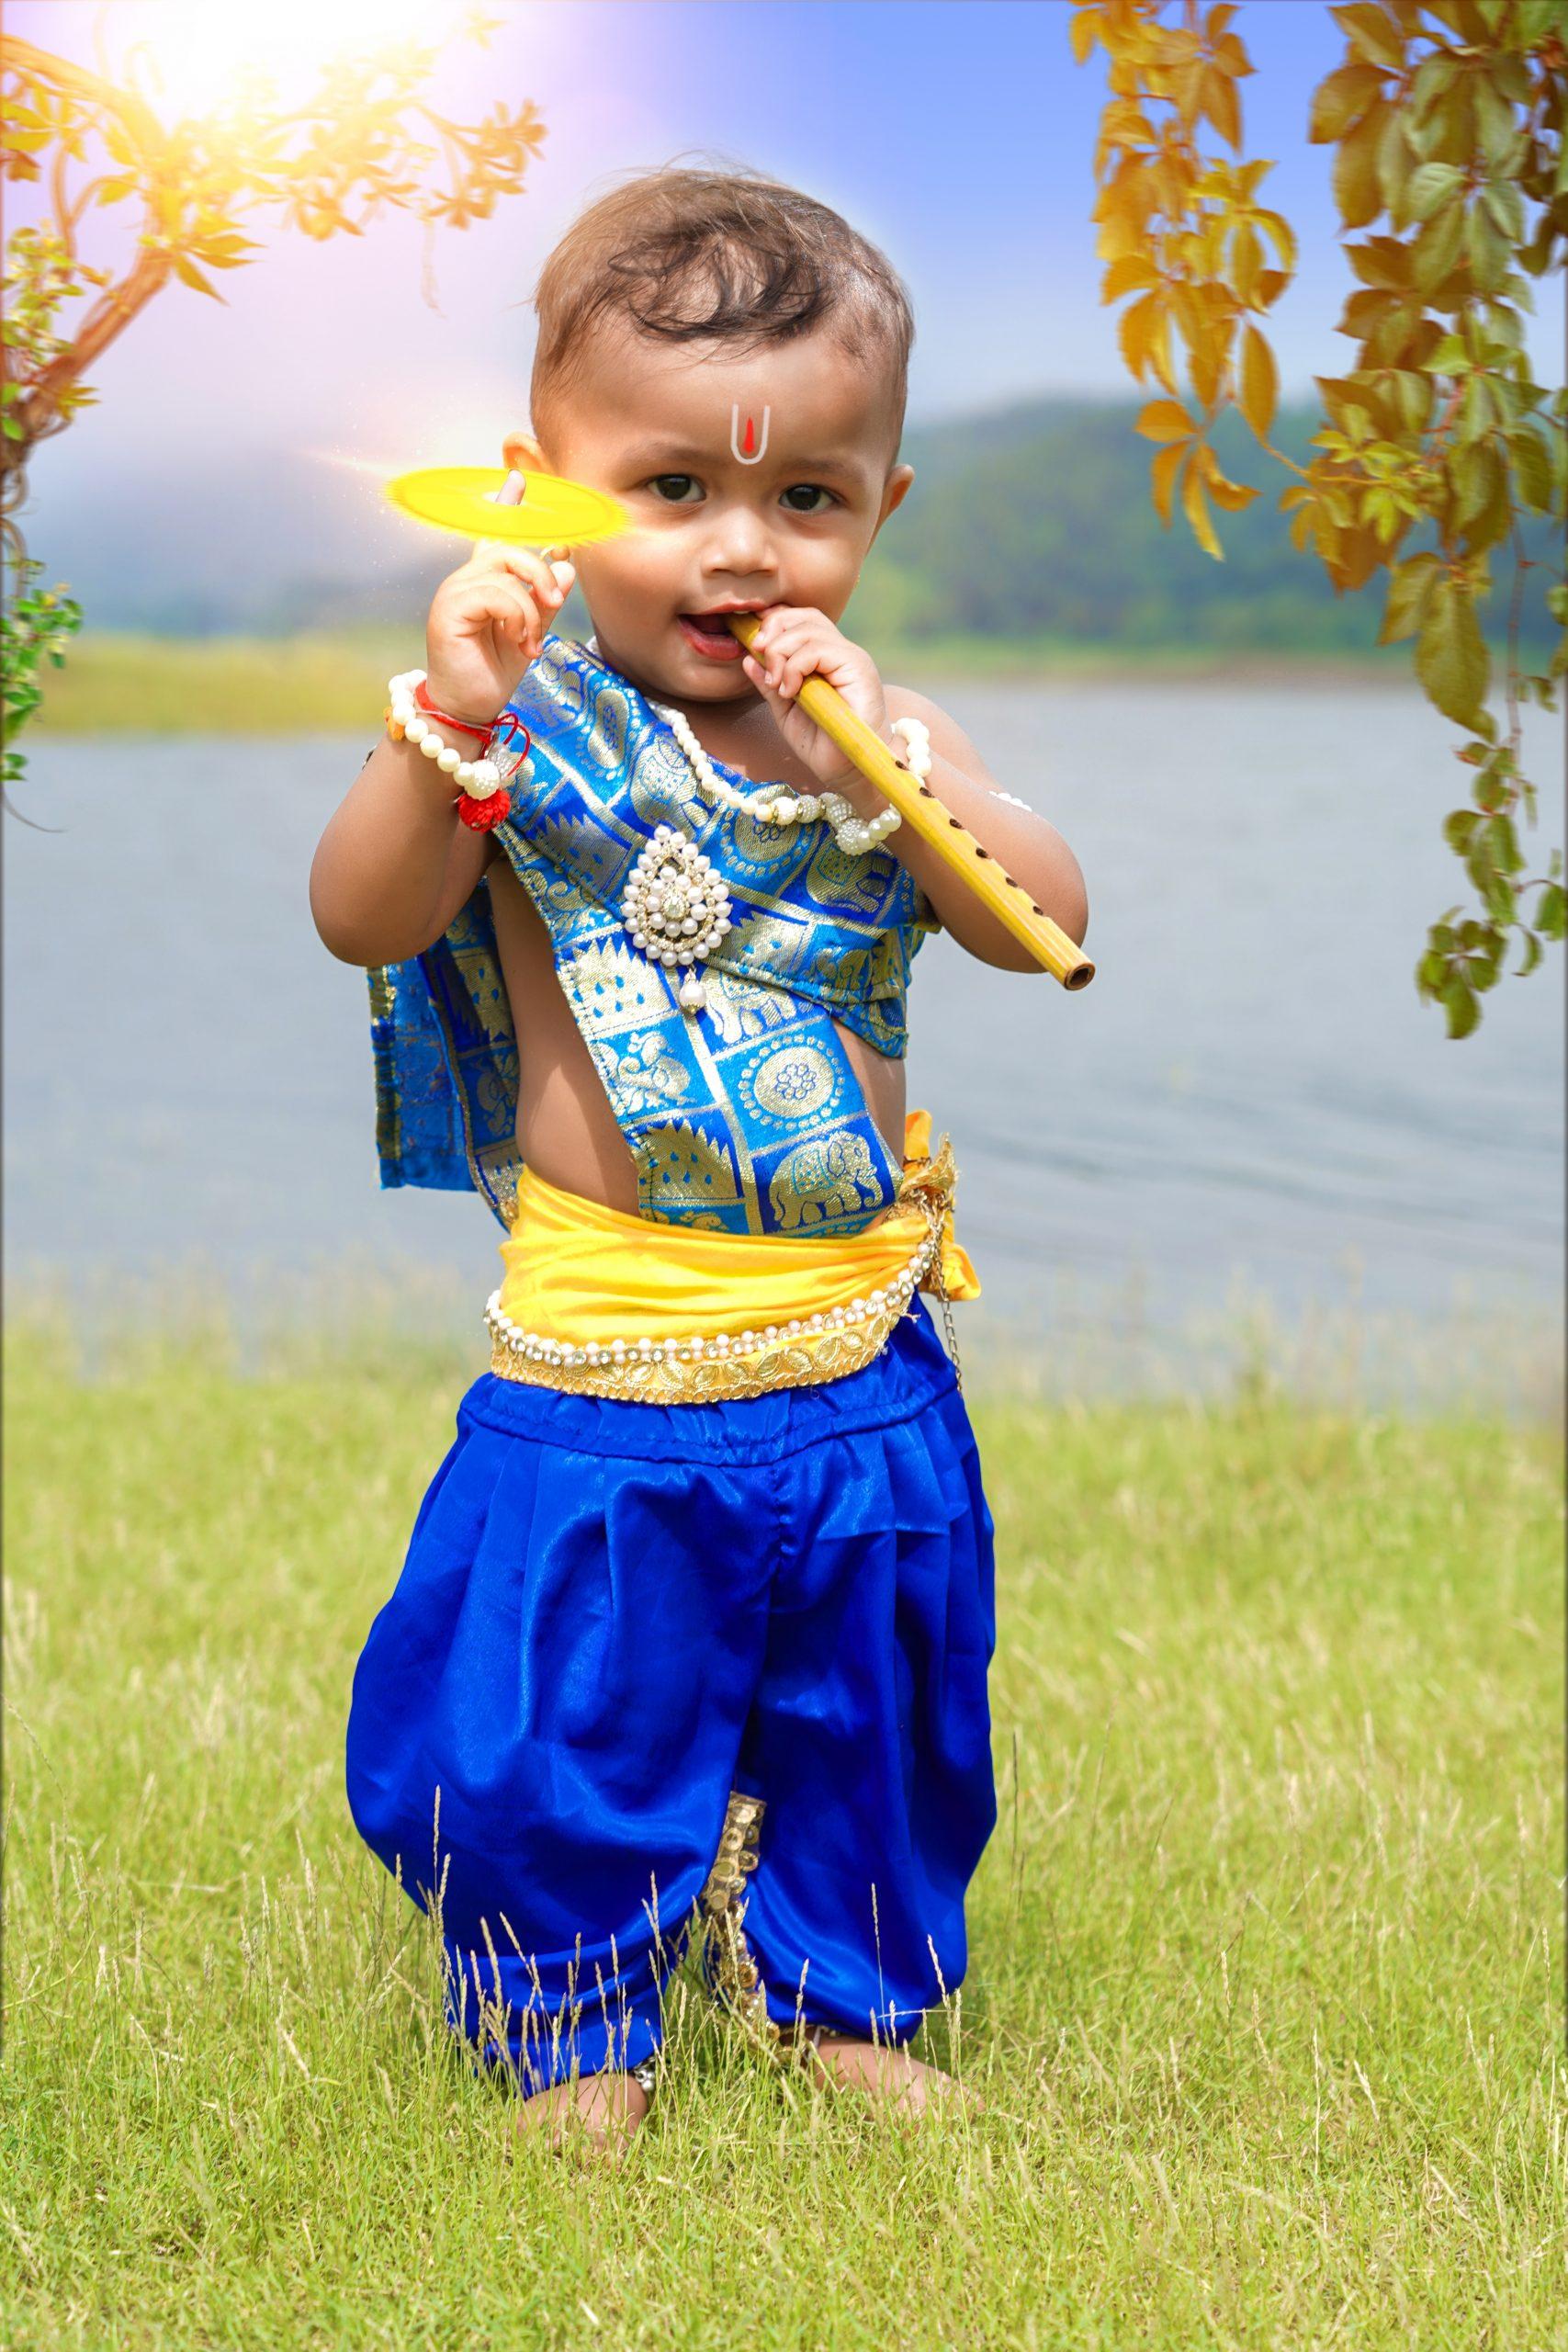 Cute baby in lord Krishna getup